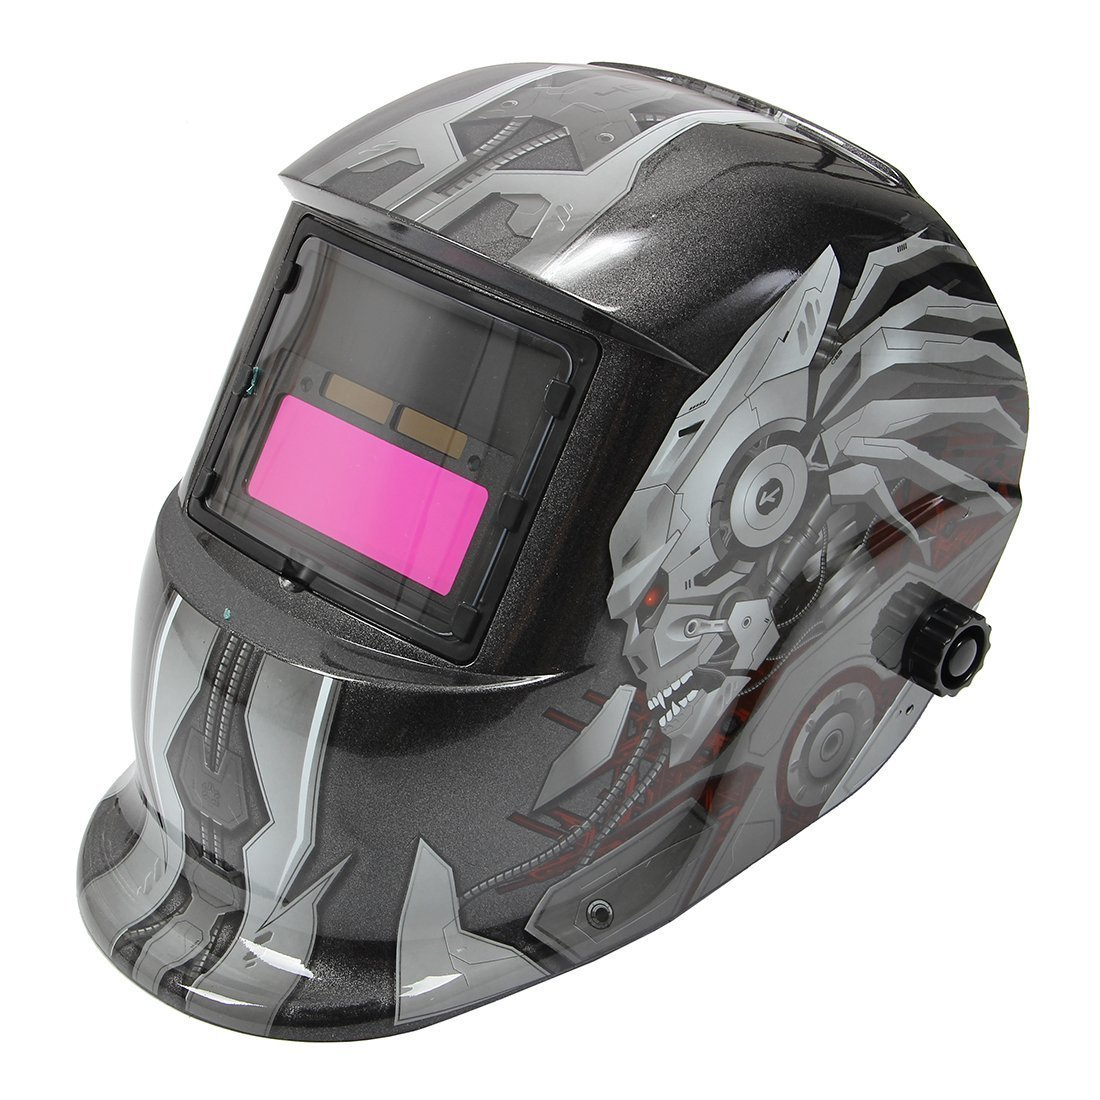 Skull Pattern Solar Auto Darkening Welding Helmet Mask Grinding Welder Mask Welding Protective Gear-Hot